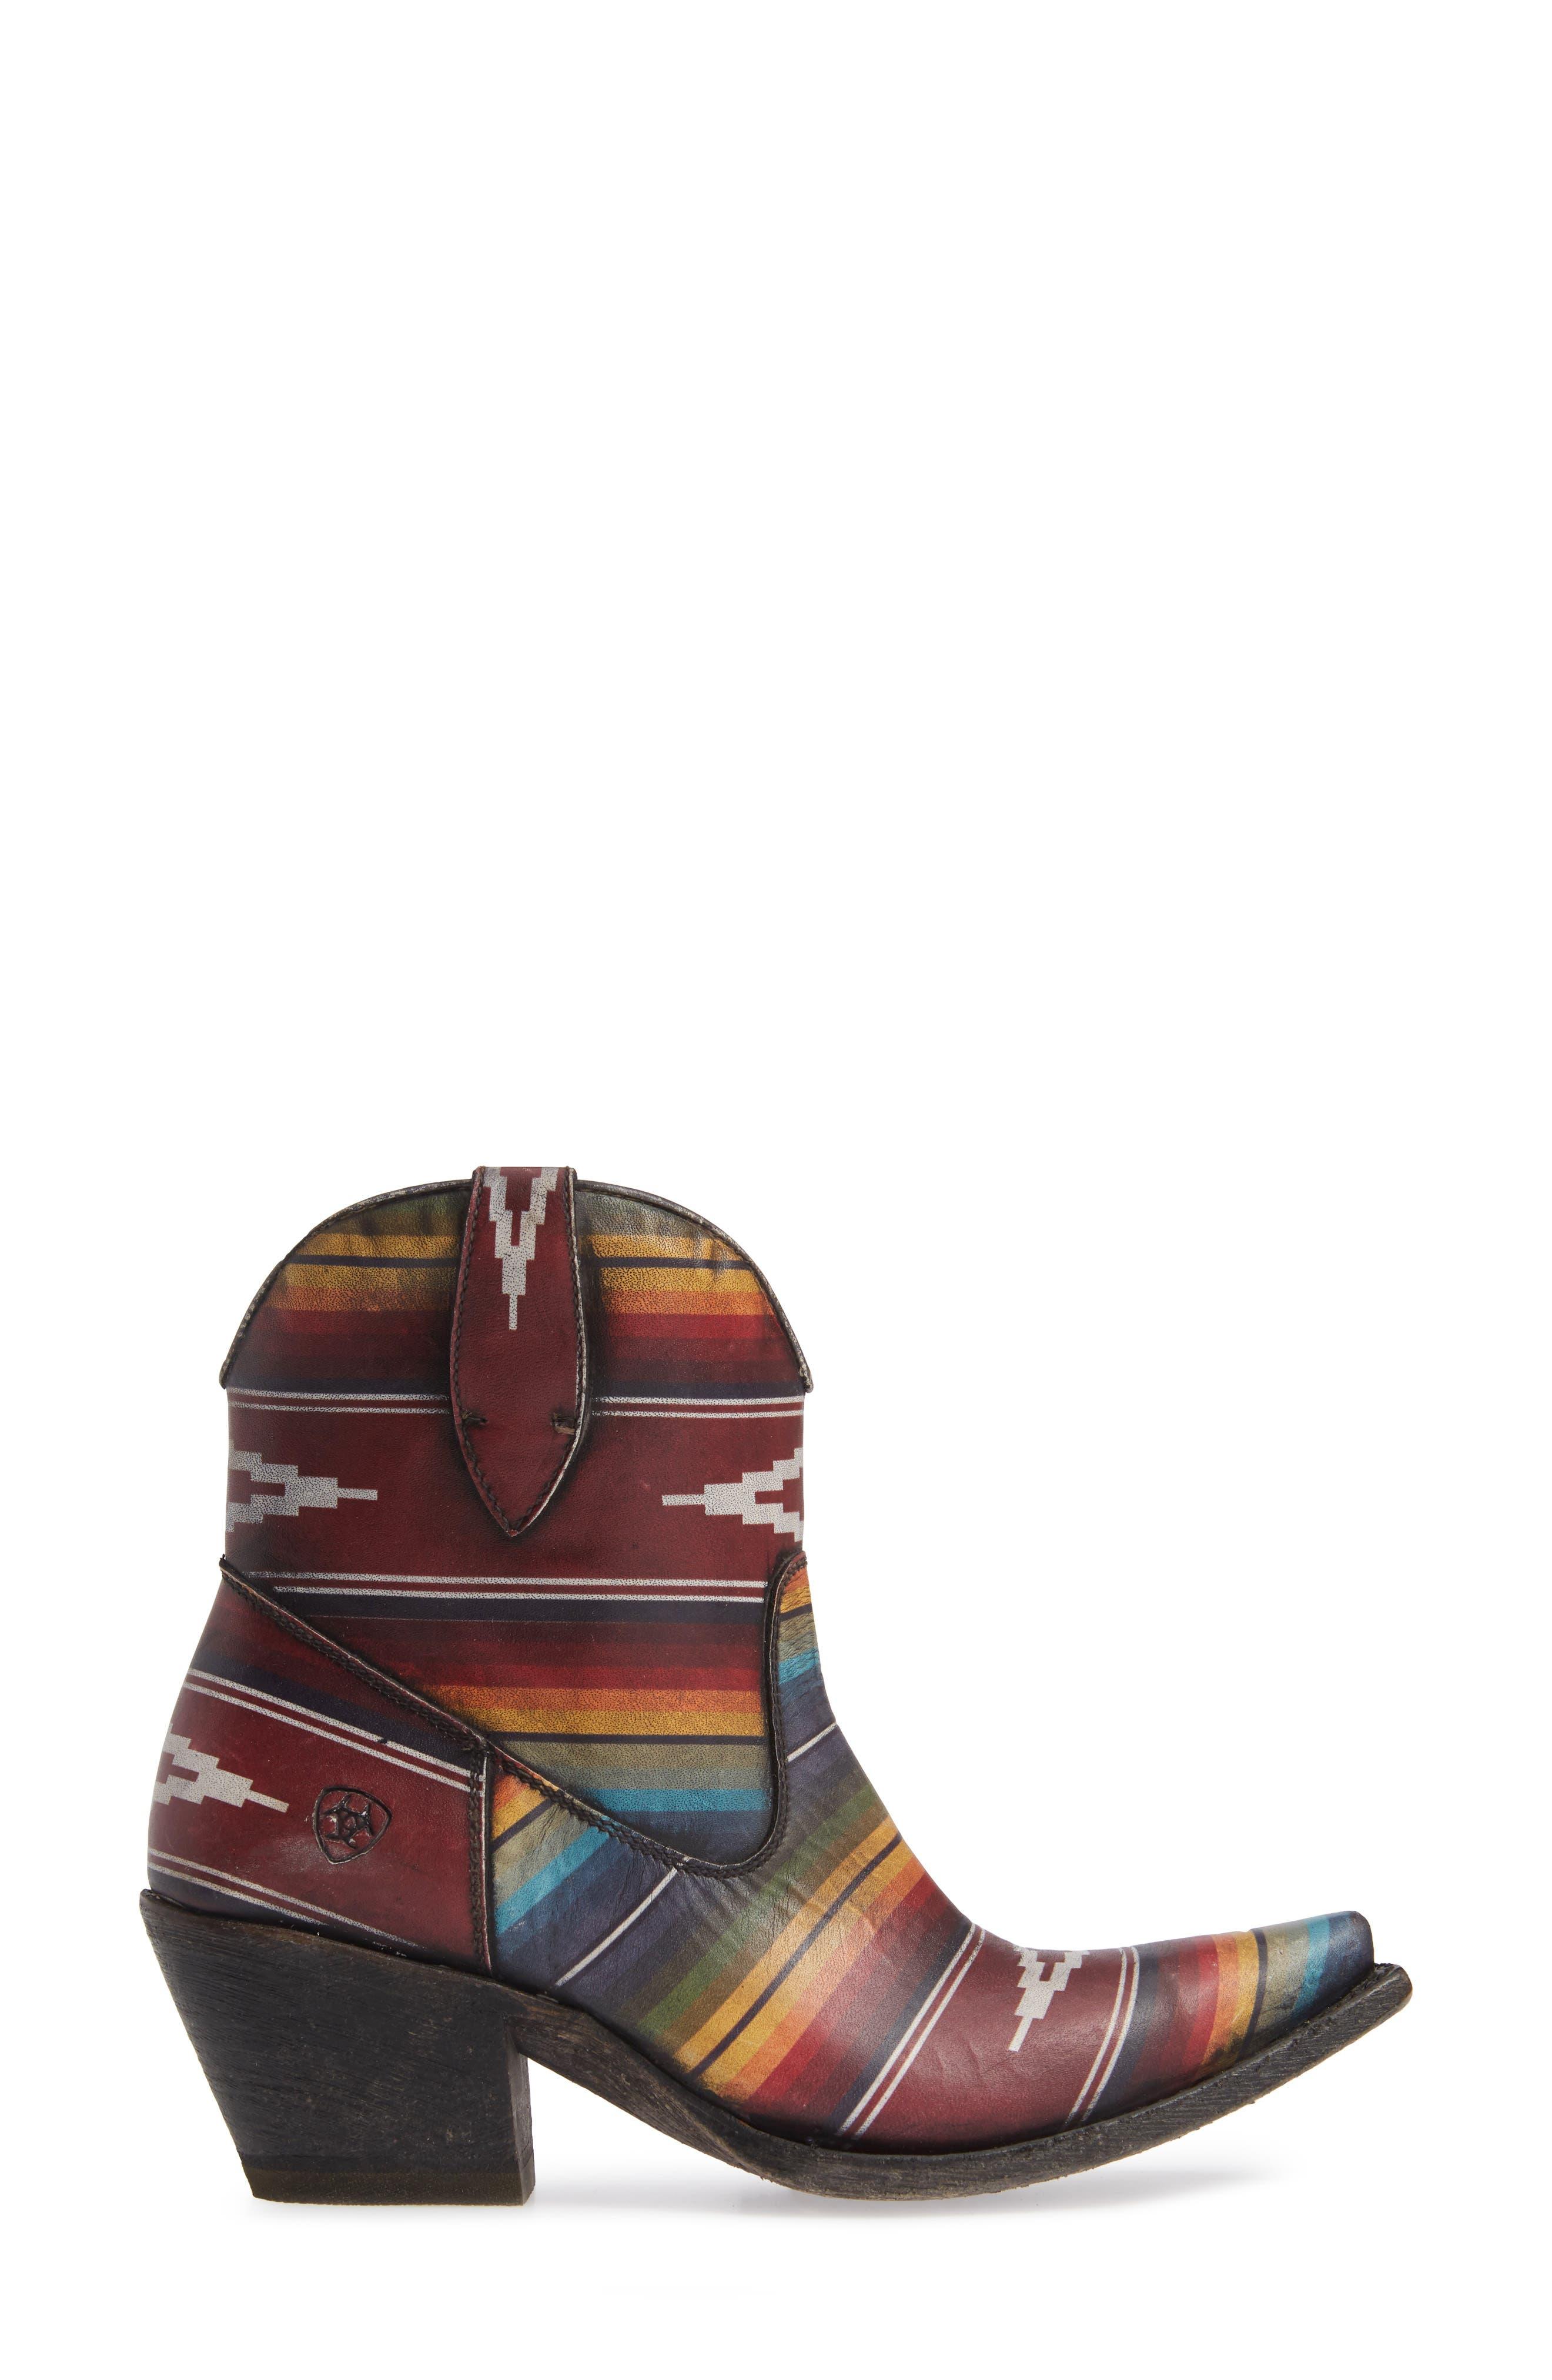 Circuit Cruz Western Boot,                             Alternate thumbnail 3, color,                             SADDLE BLANKET LEATHER